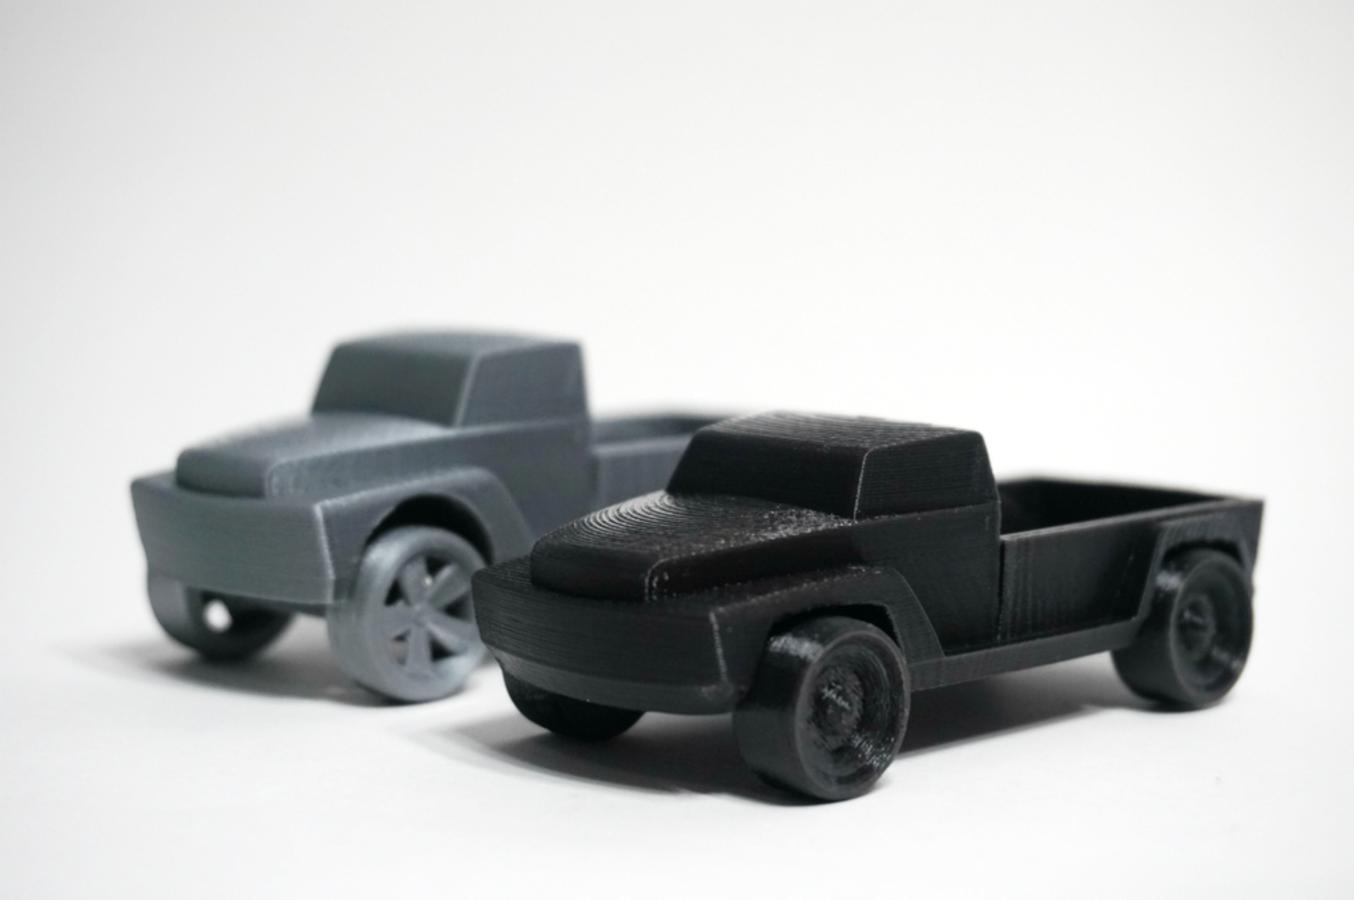 Capture d'écran 2016-10-20 à 16.47.12.png Download free STL file Pickup Truck • 3D printable template, WallTosh